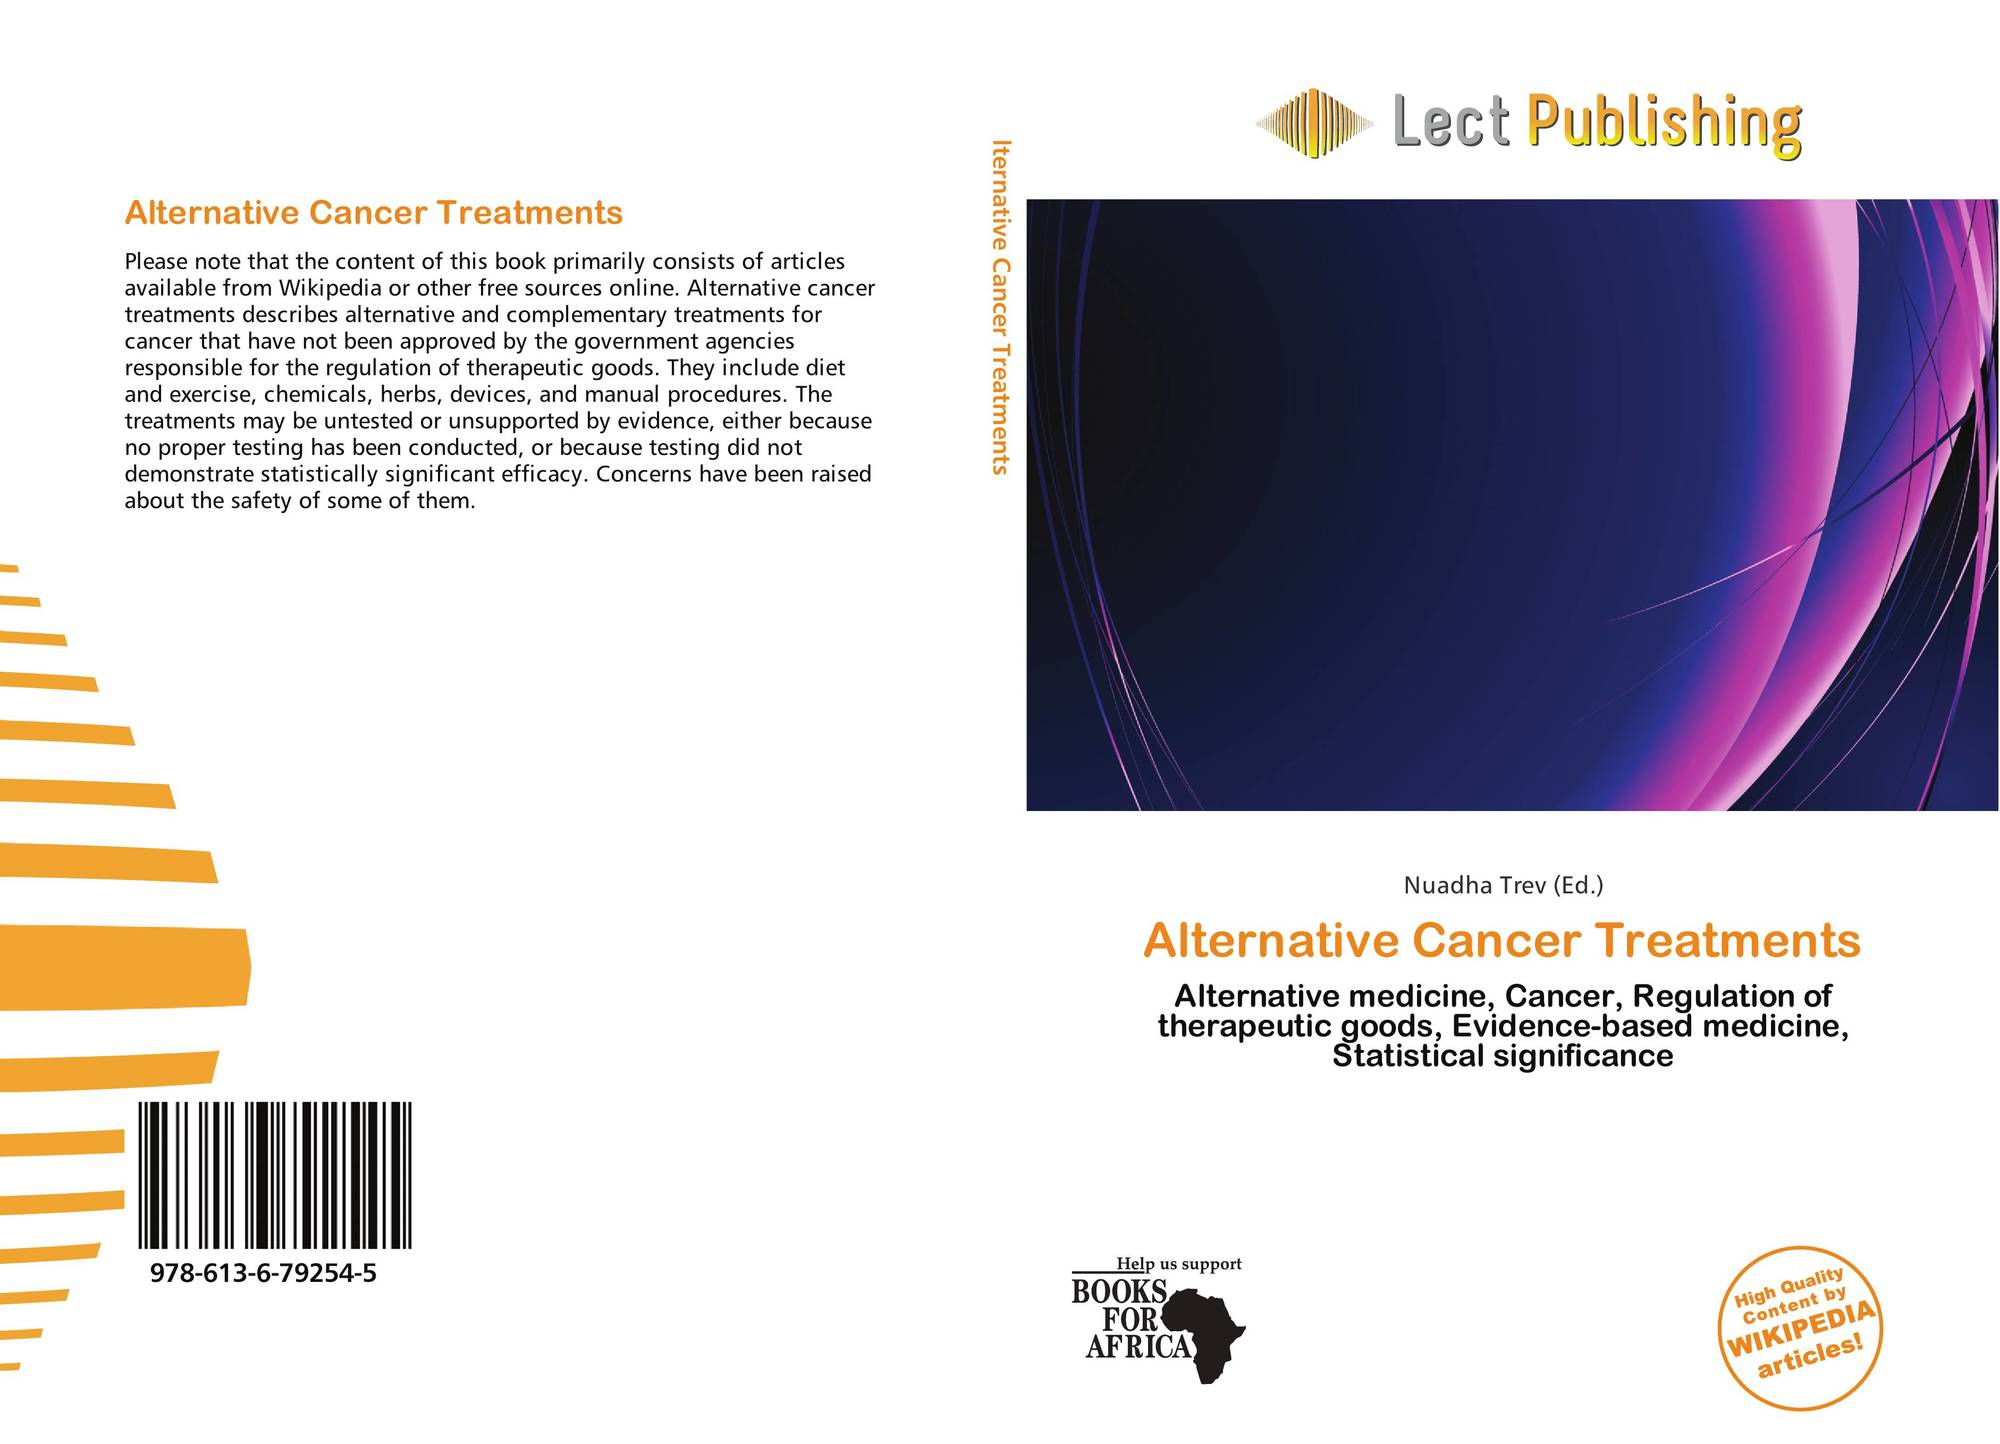 Alternative Cancer Treatments, 978-613-6-79254-5, 6136792540